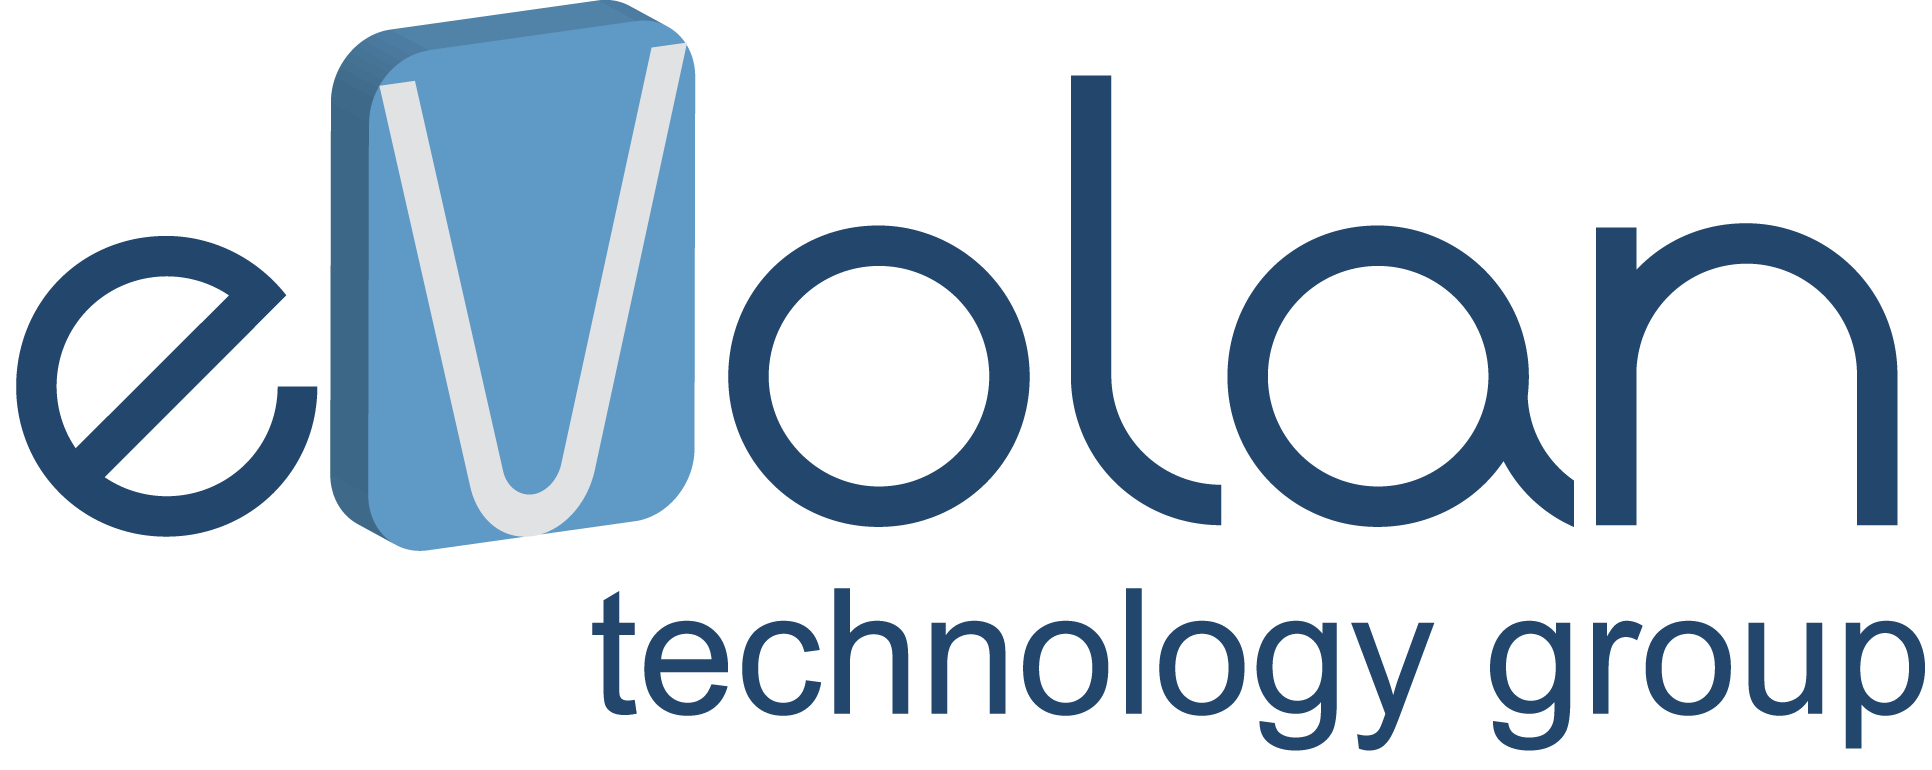 eVolan logo